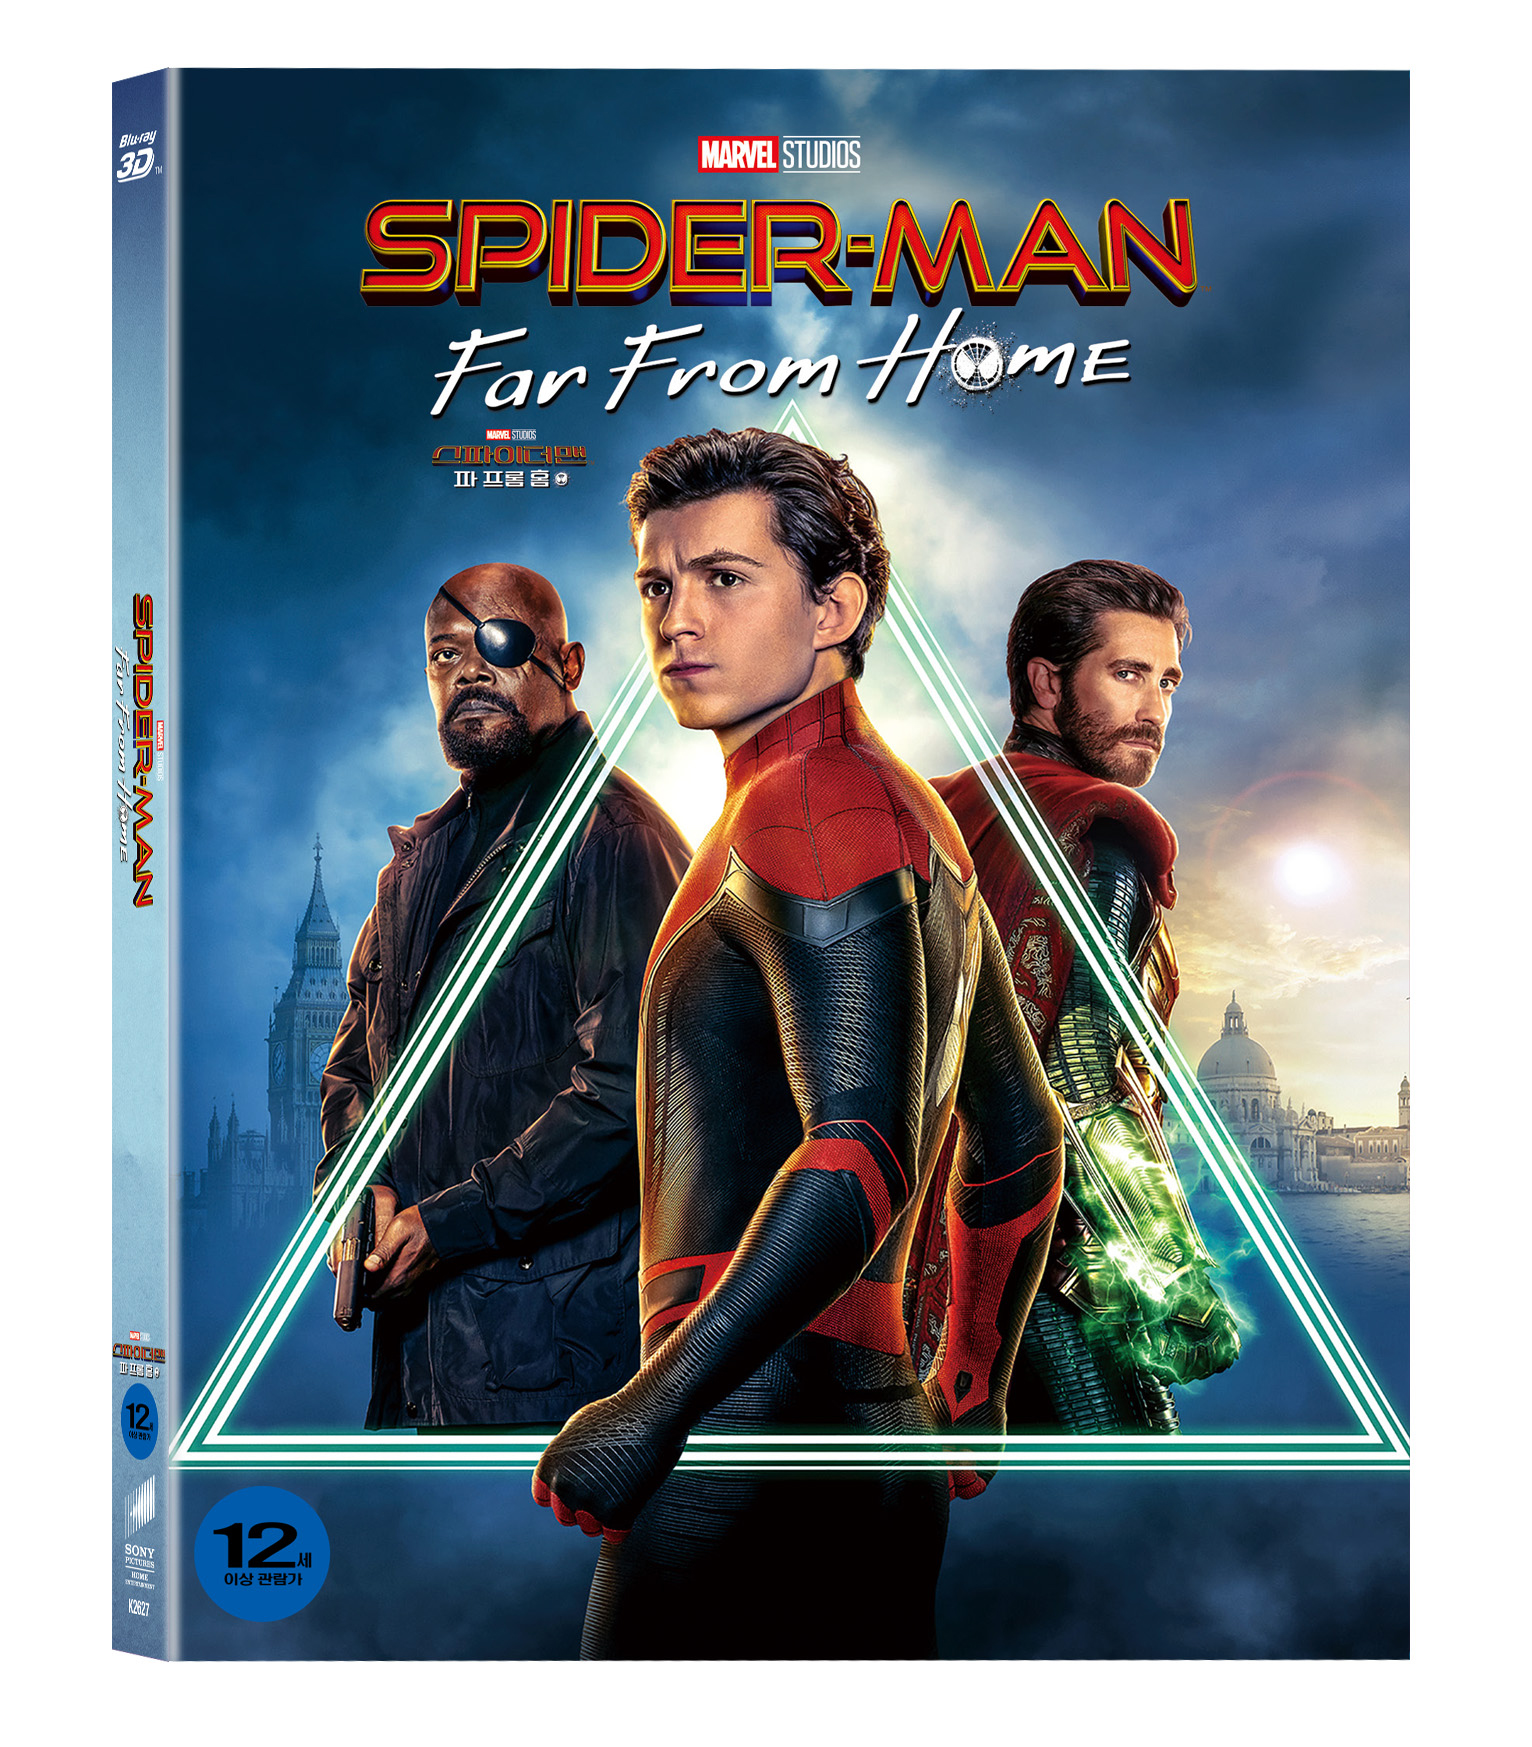 [Blu-ray] Spider-Man: Far From Home Slipcase(3disc: 3D + 2D + Bonus Disc) Limited Editon